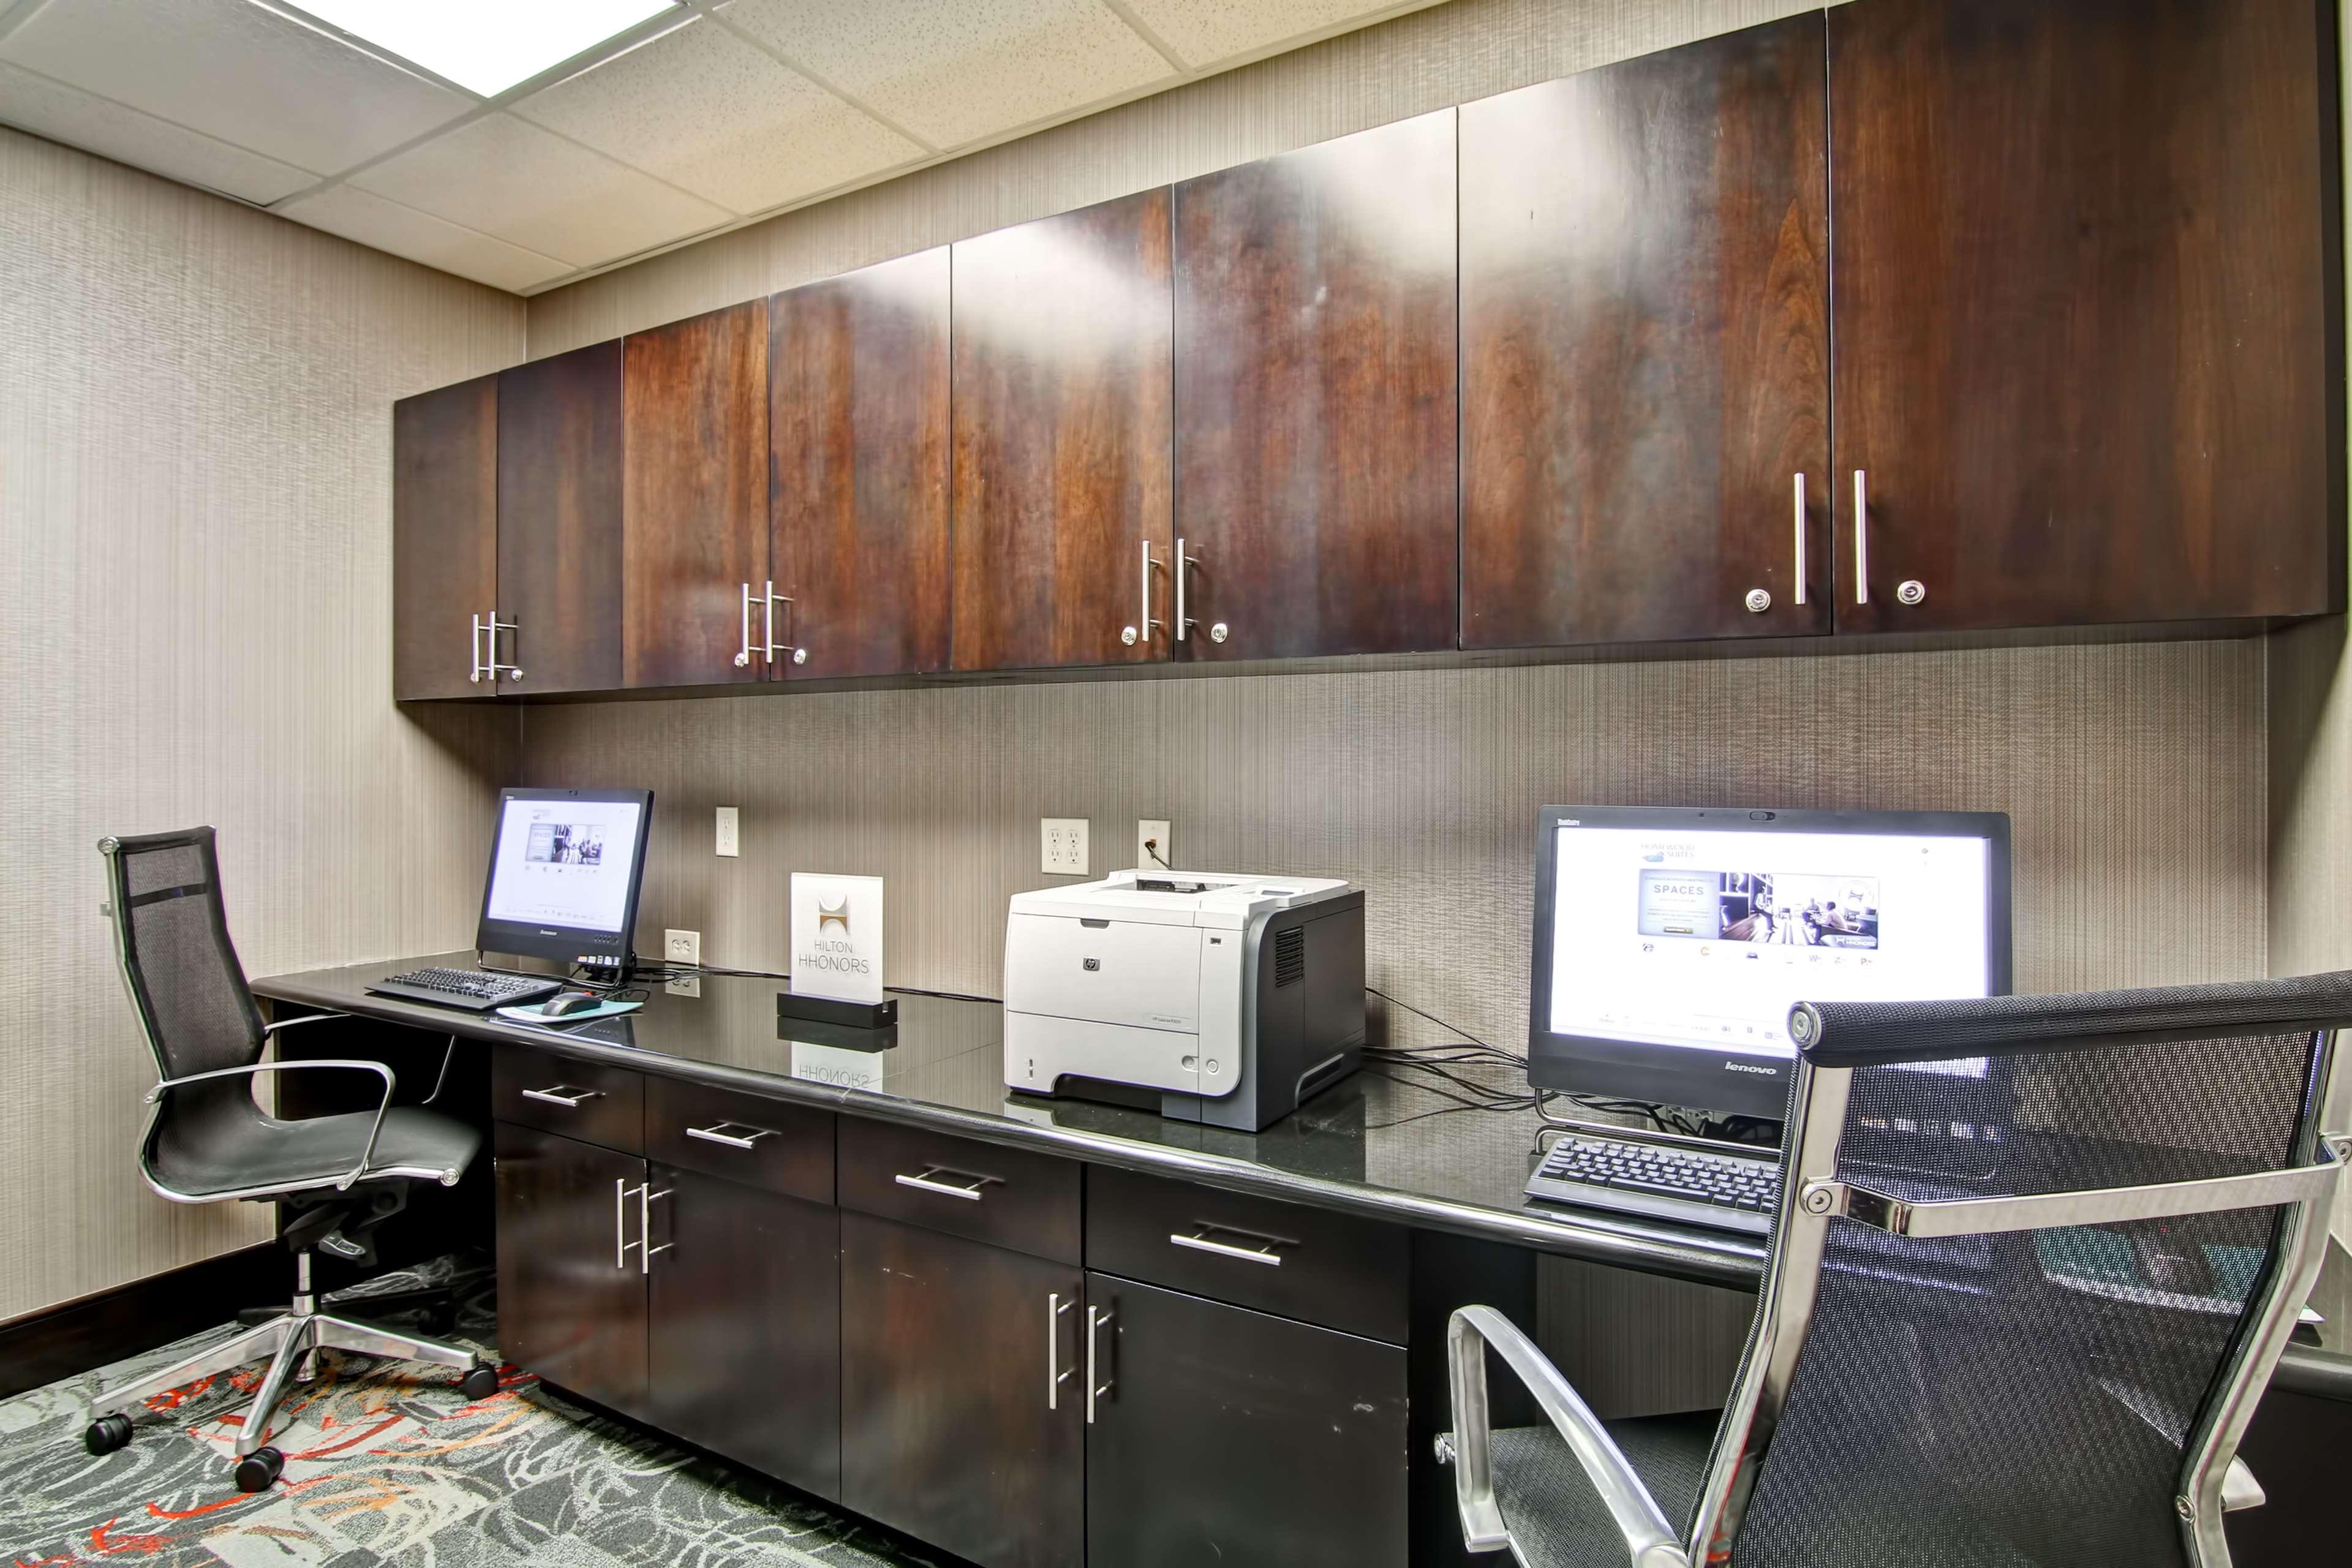 Homewood Suites by Hilton Cincinnati Airport South-Florence image 42